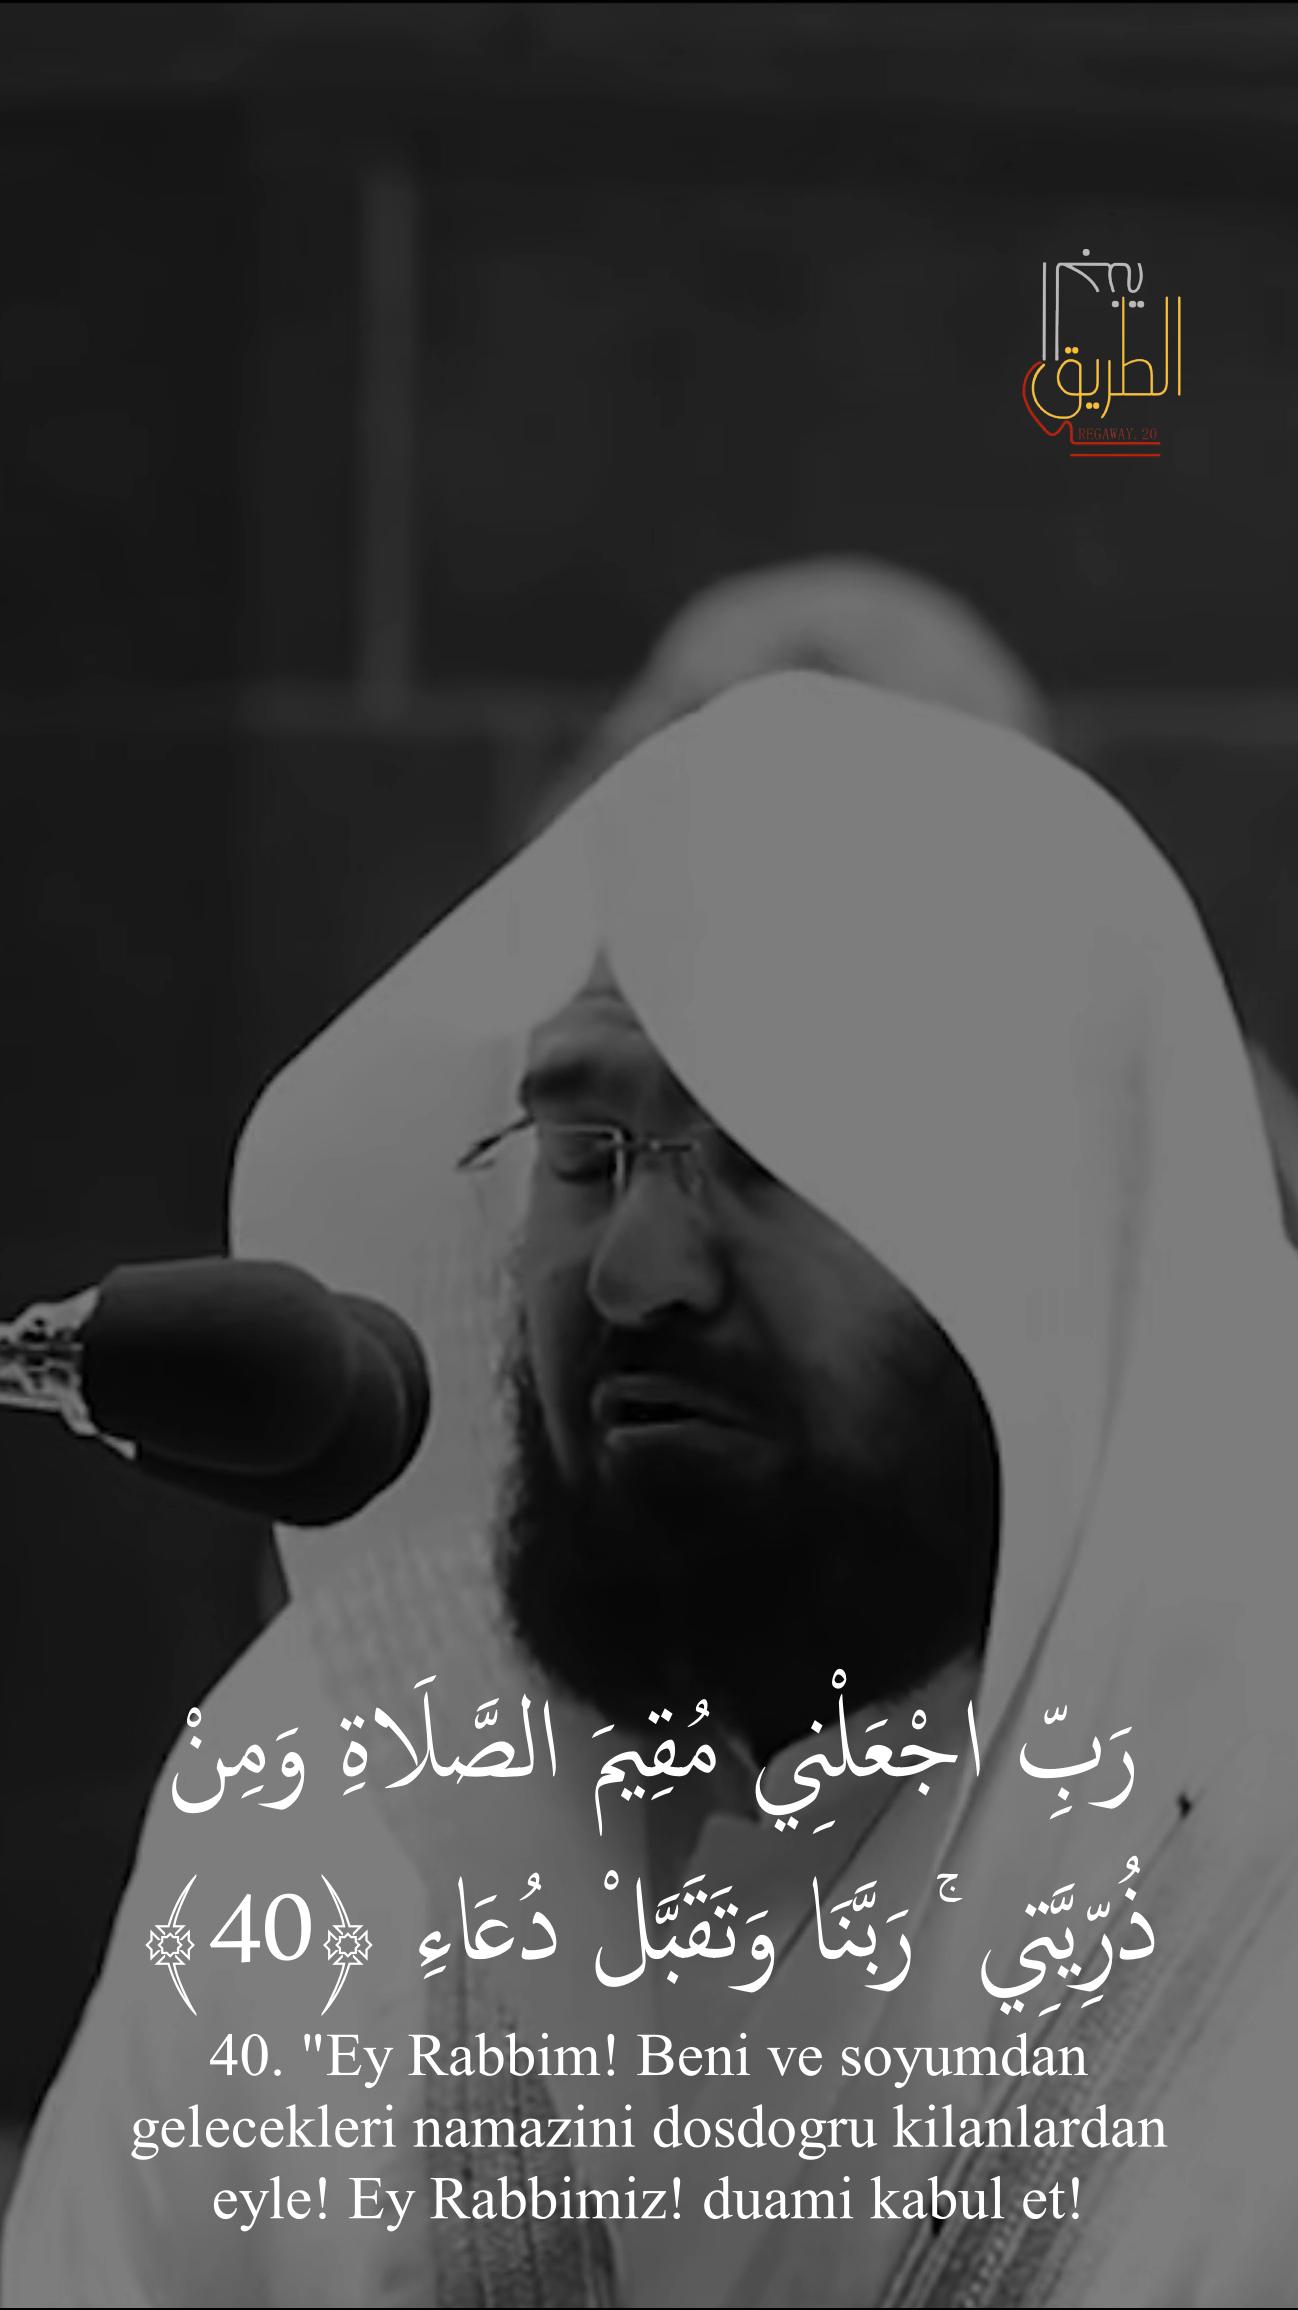 Very Emotional Quran Recitation By Alsudais Video 2021 Mekke Videolar